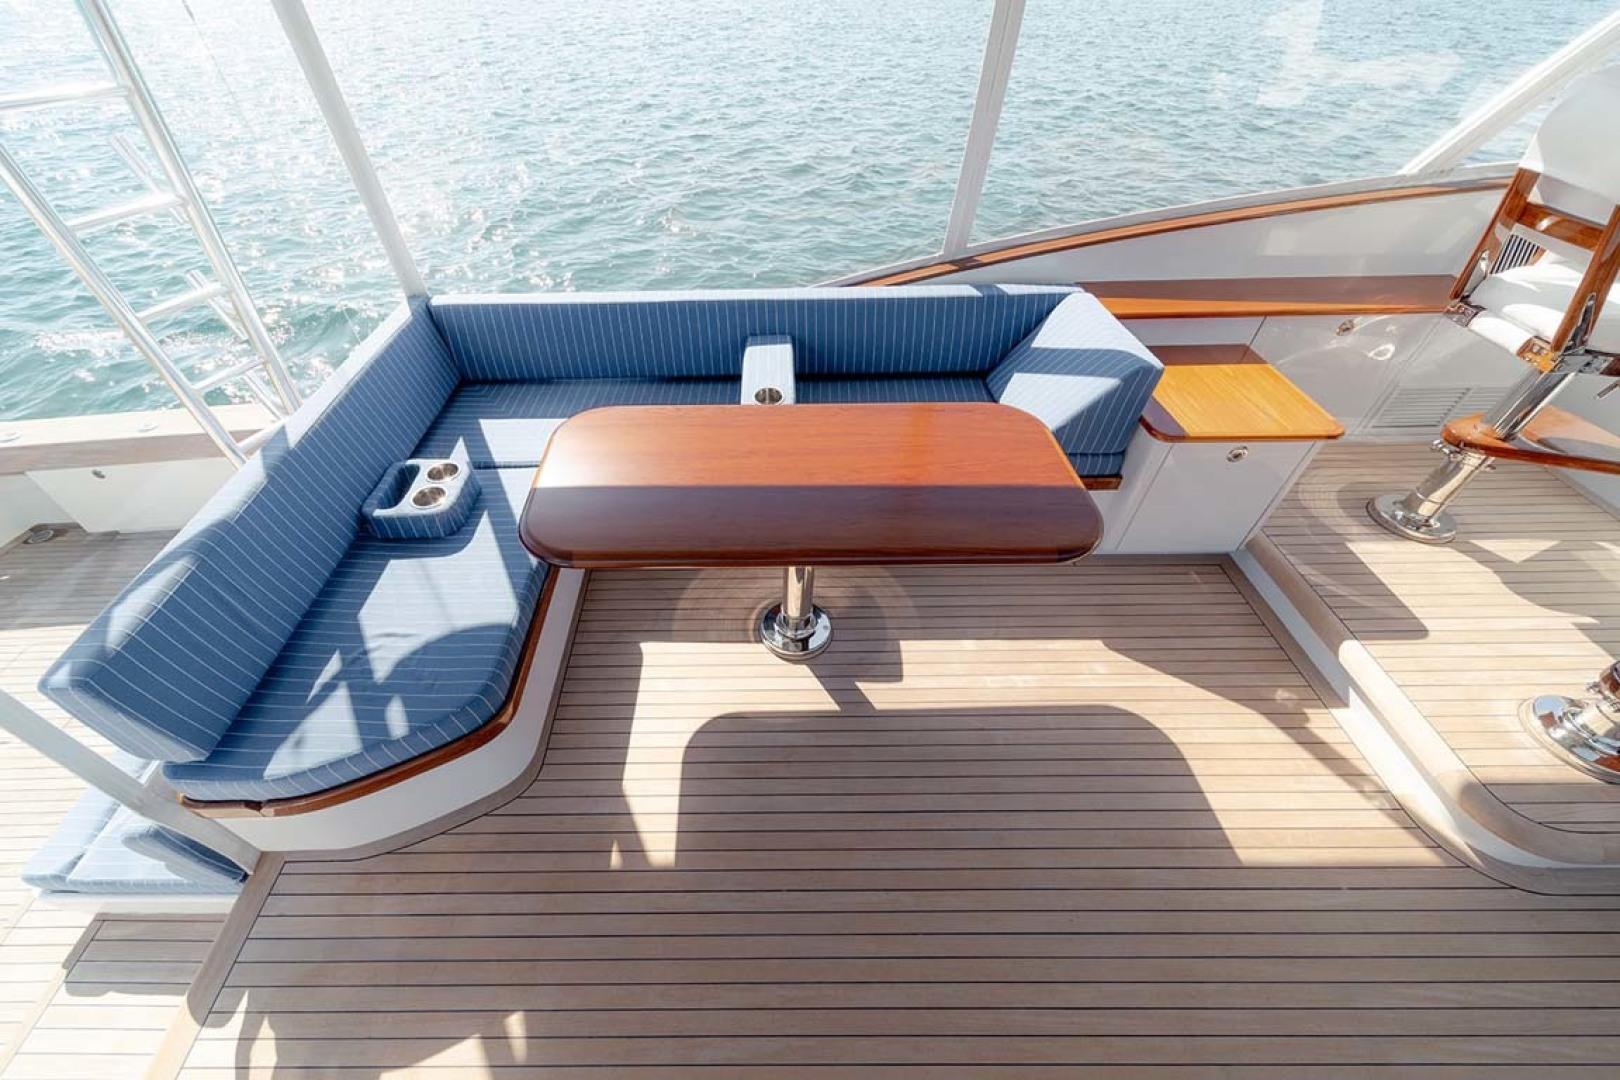 Jim Smith-Walkaround Express 2018-Eurybia North Palm Beach-Florida-United States-Portside Teak Table with 90 Degree Angle Seating-1573734   Thumbnail